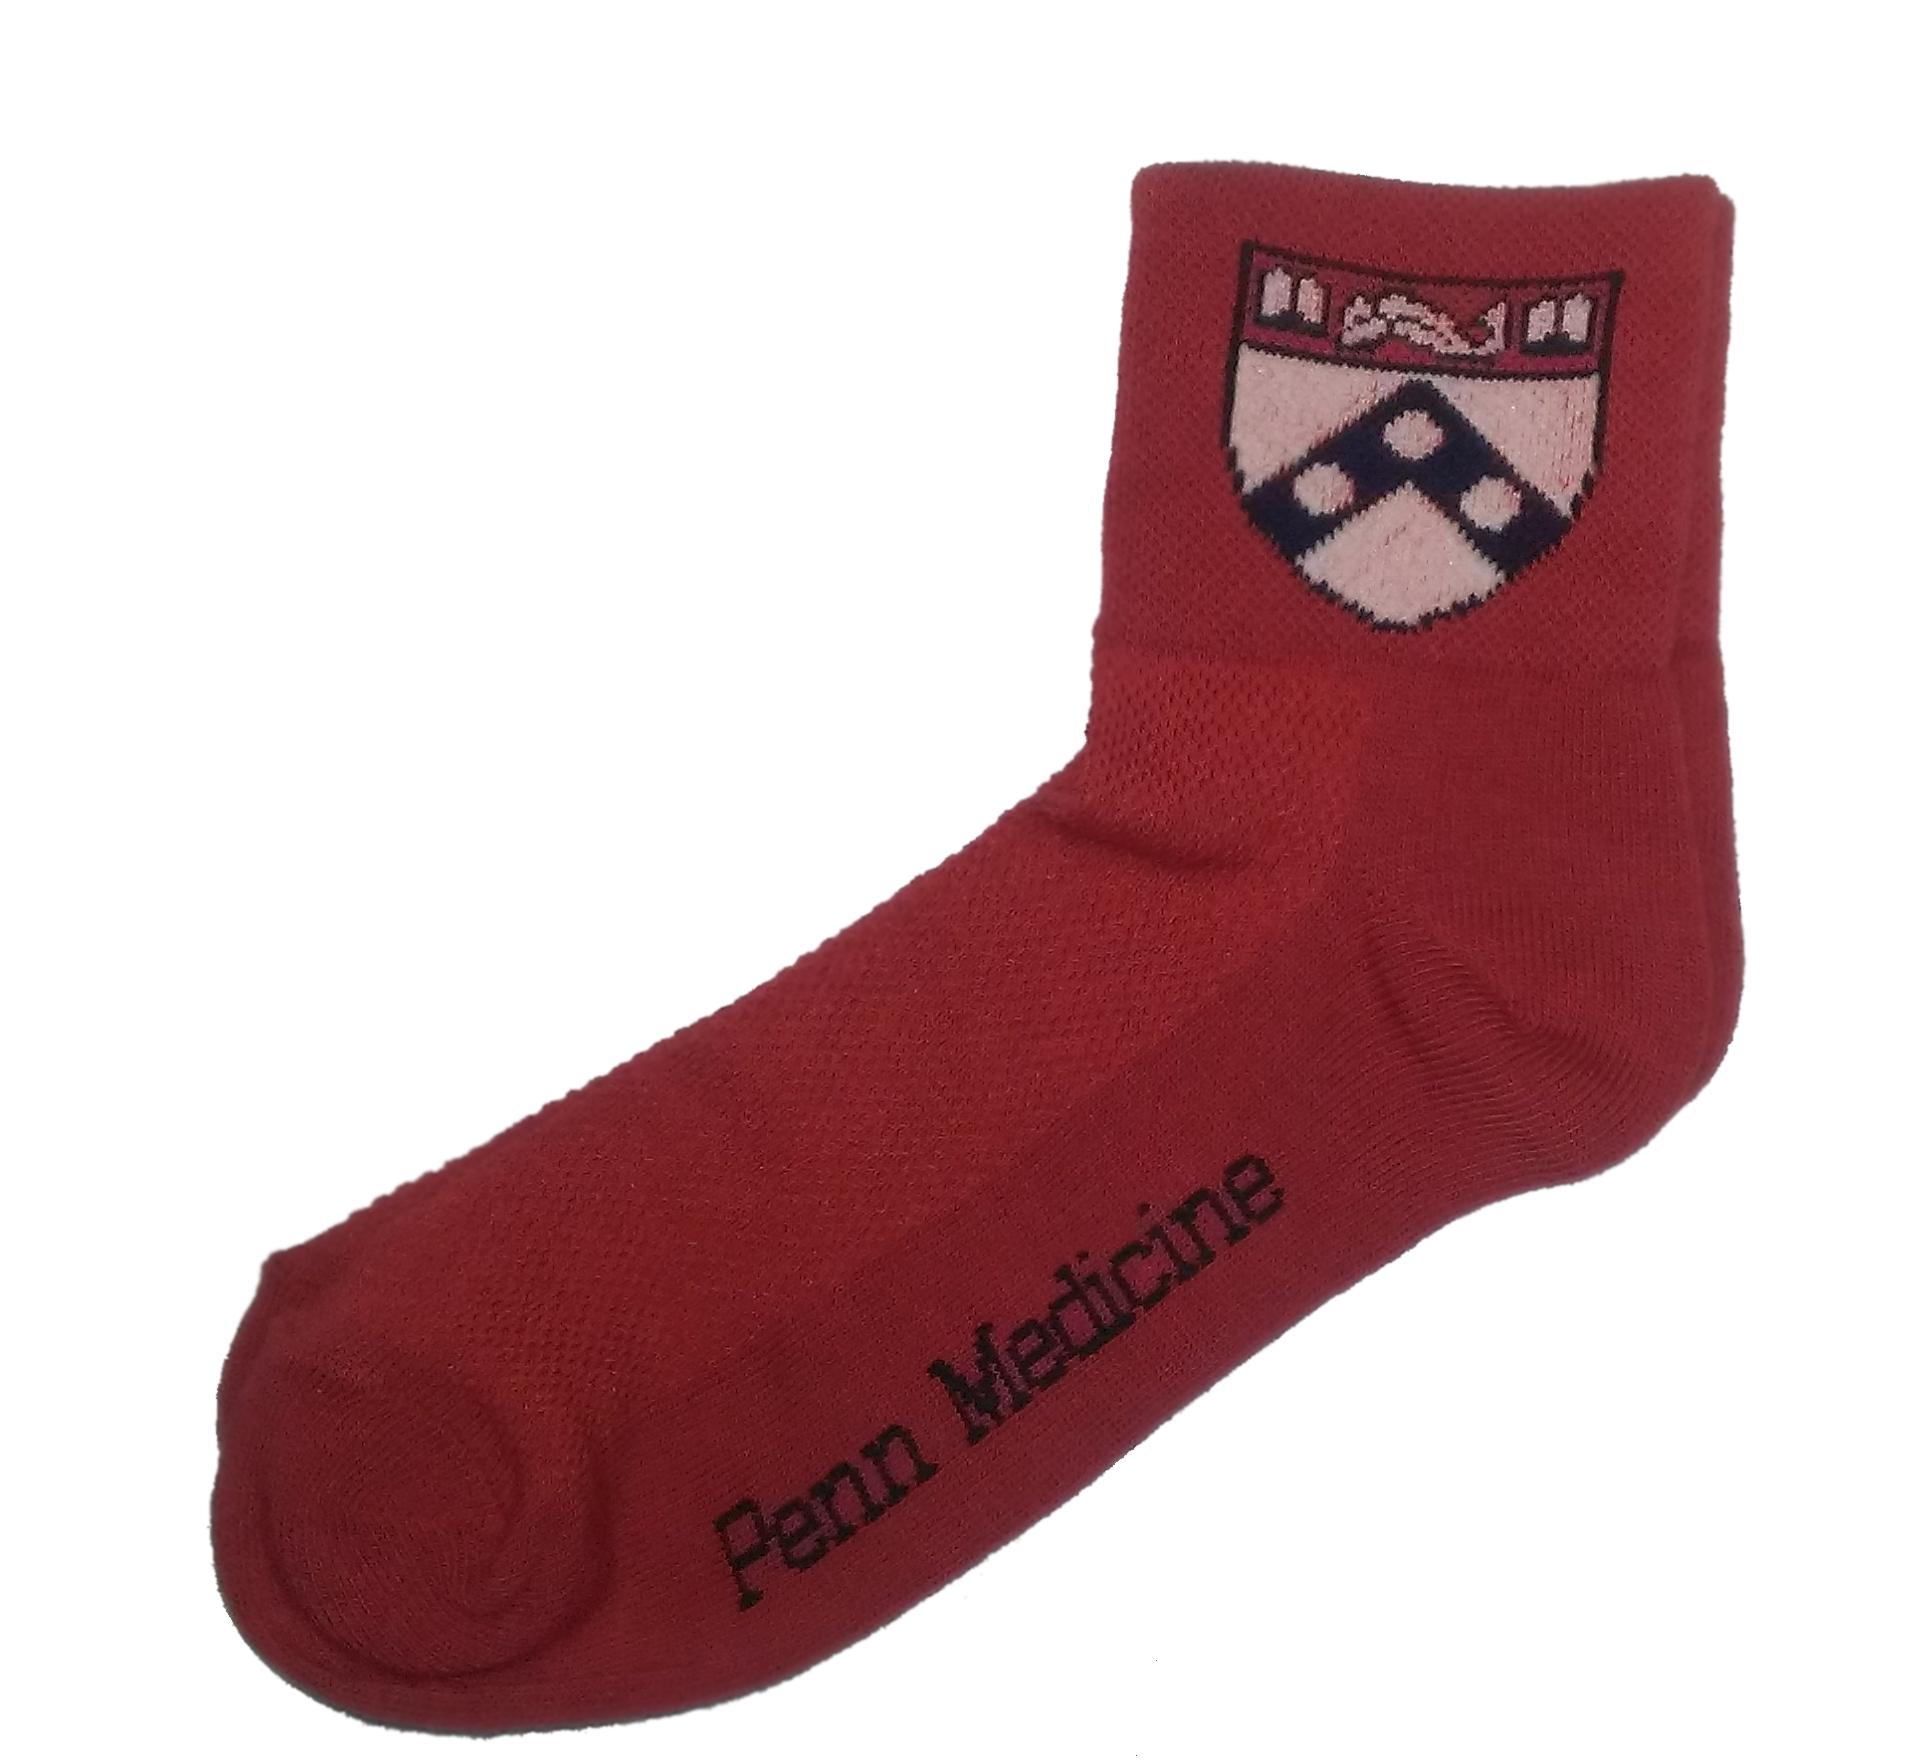 Custom-Socks-NLZ-Penn-Medicine.jpg